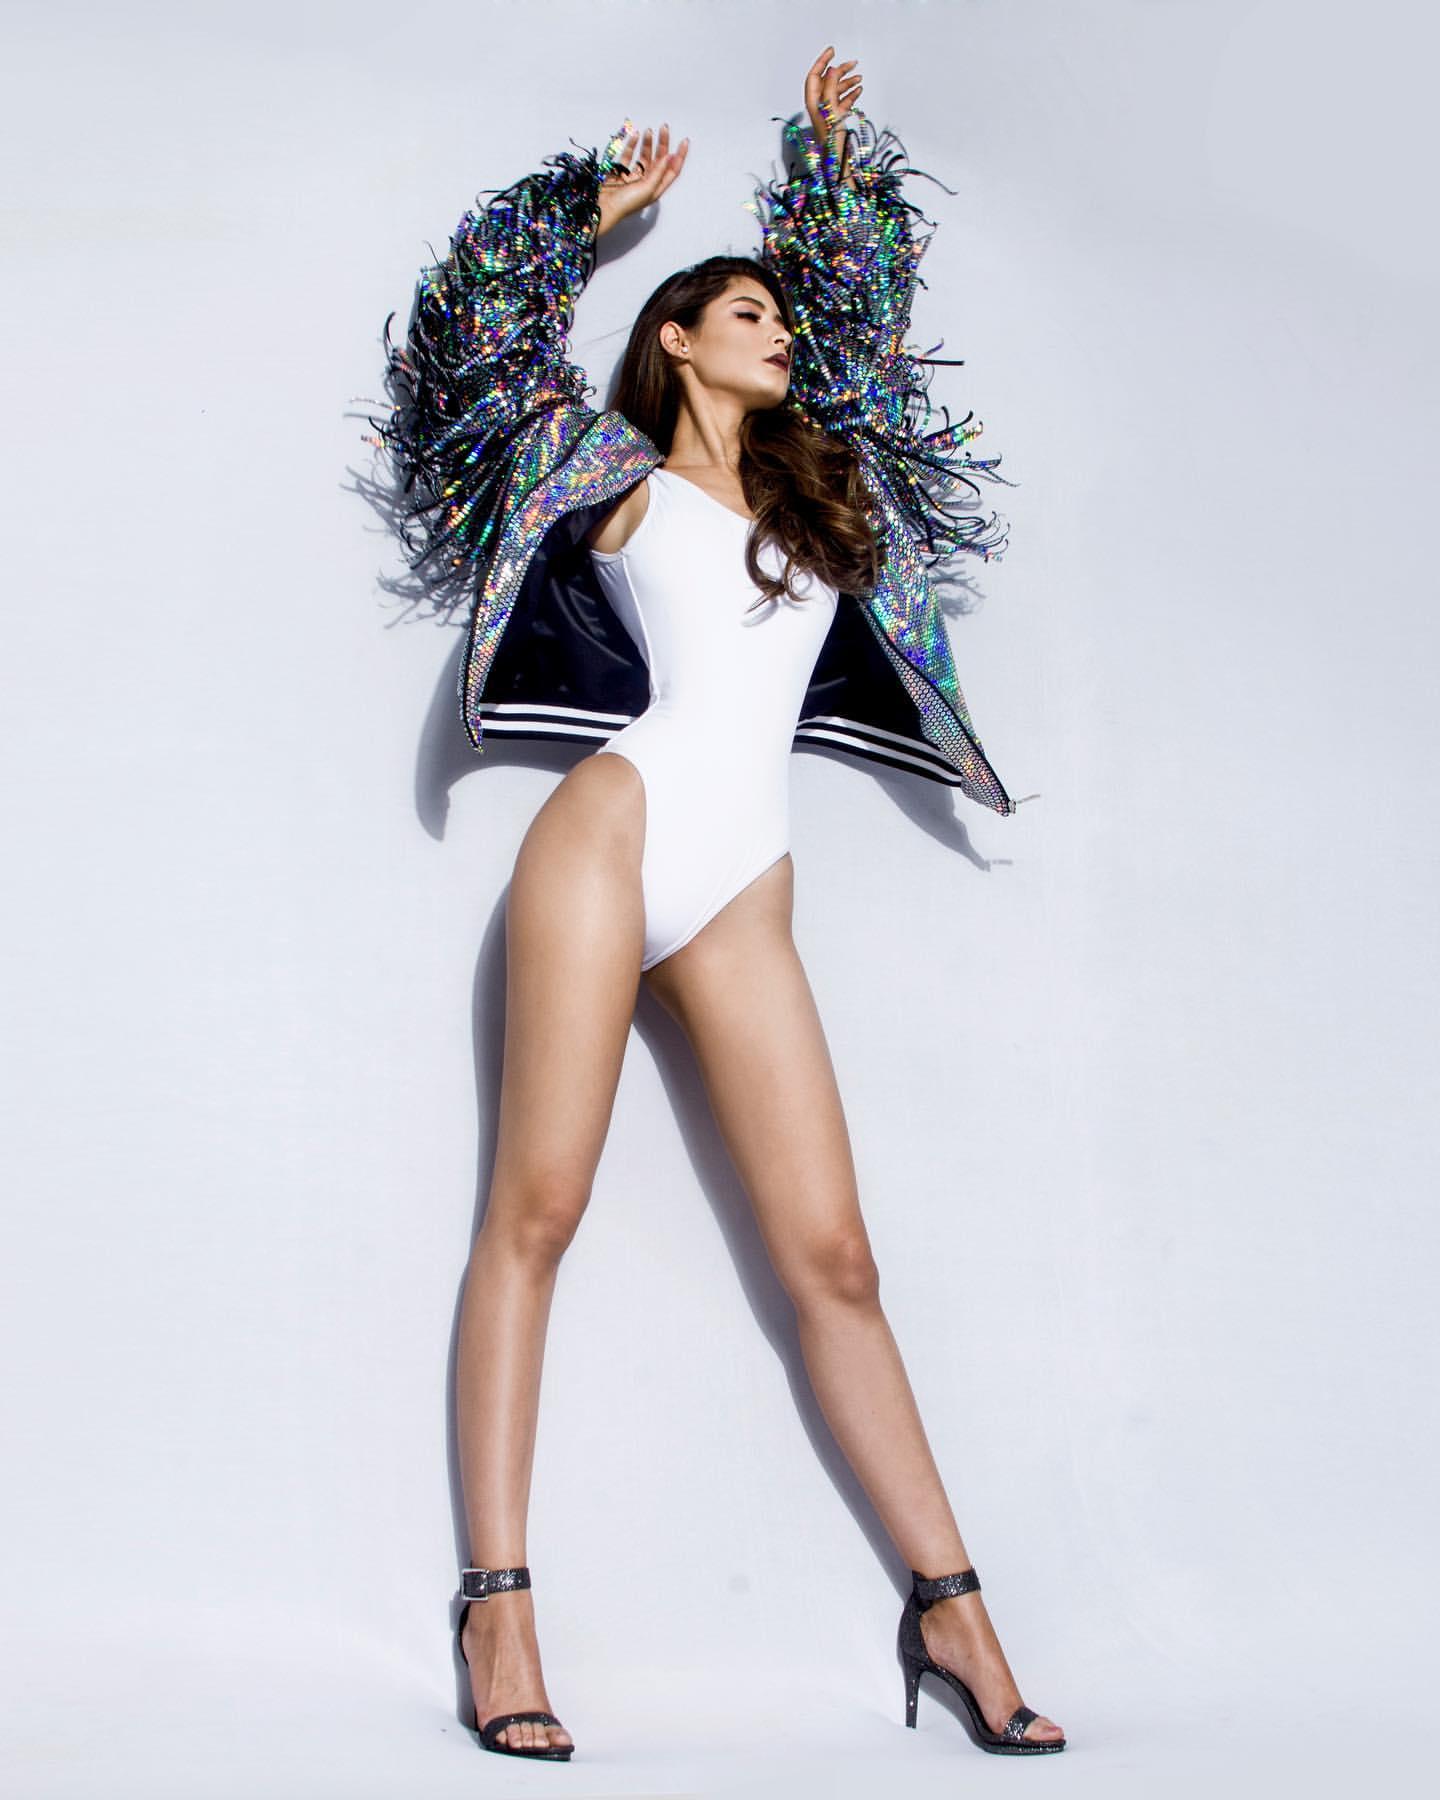 angela leon yuriar, top 21 de miss grand international 2020. - Página 3 66123210